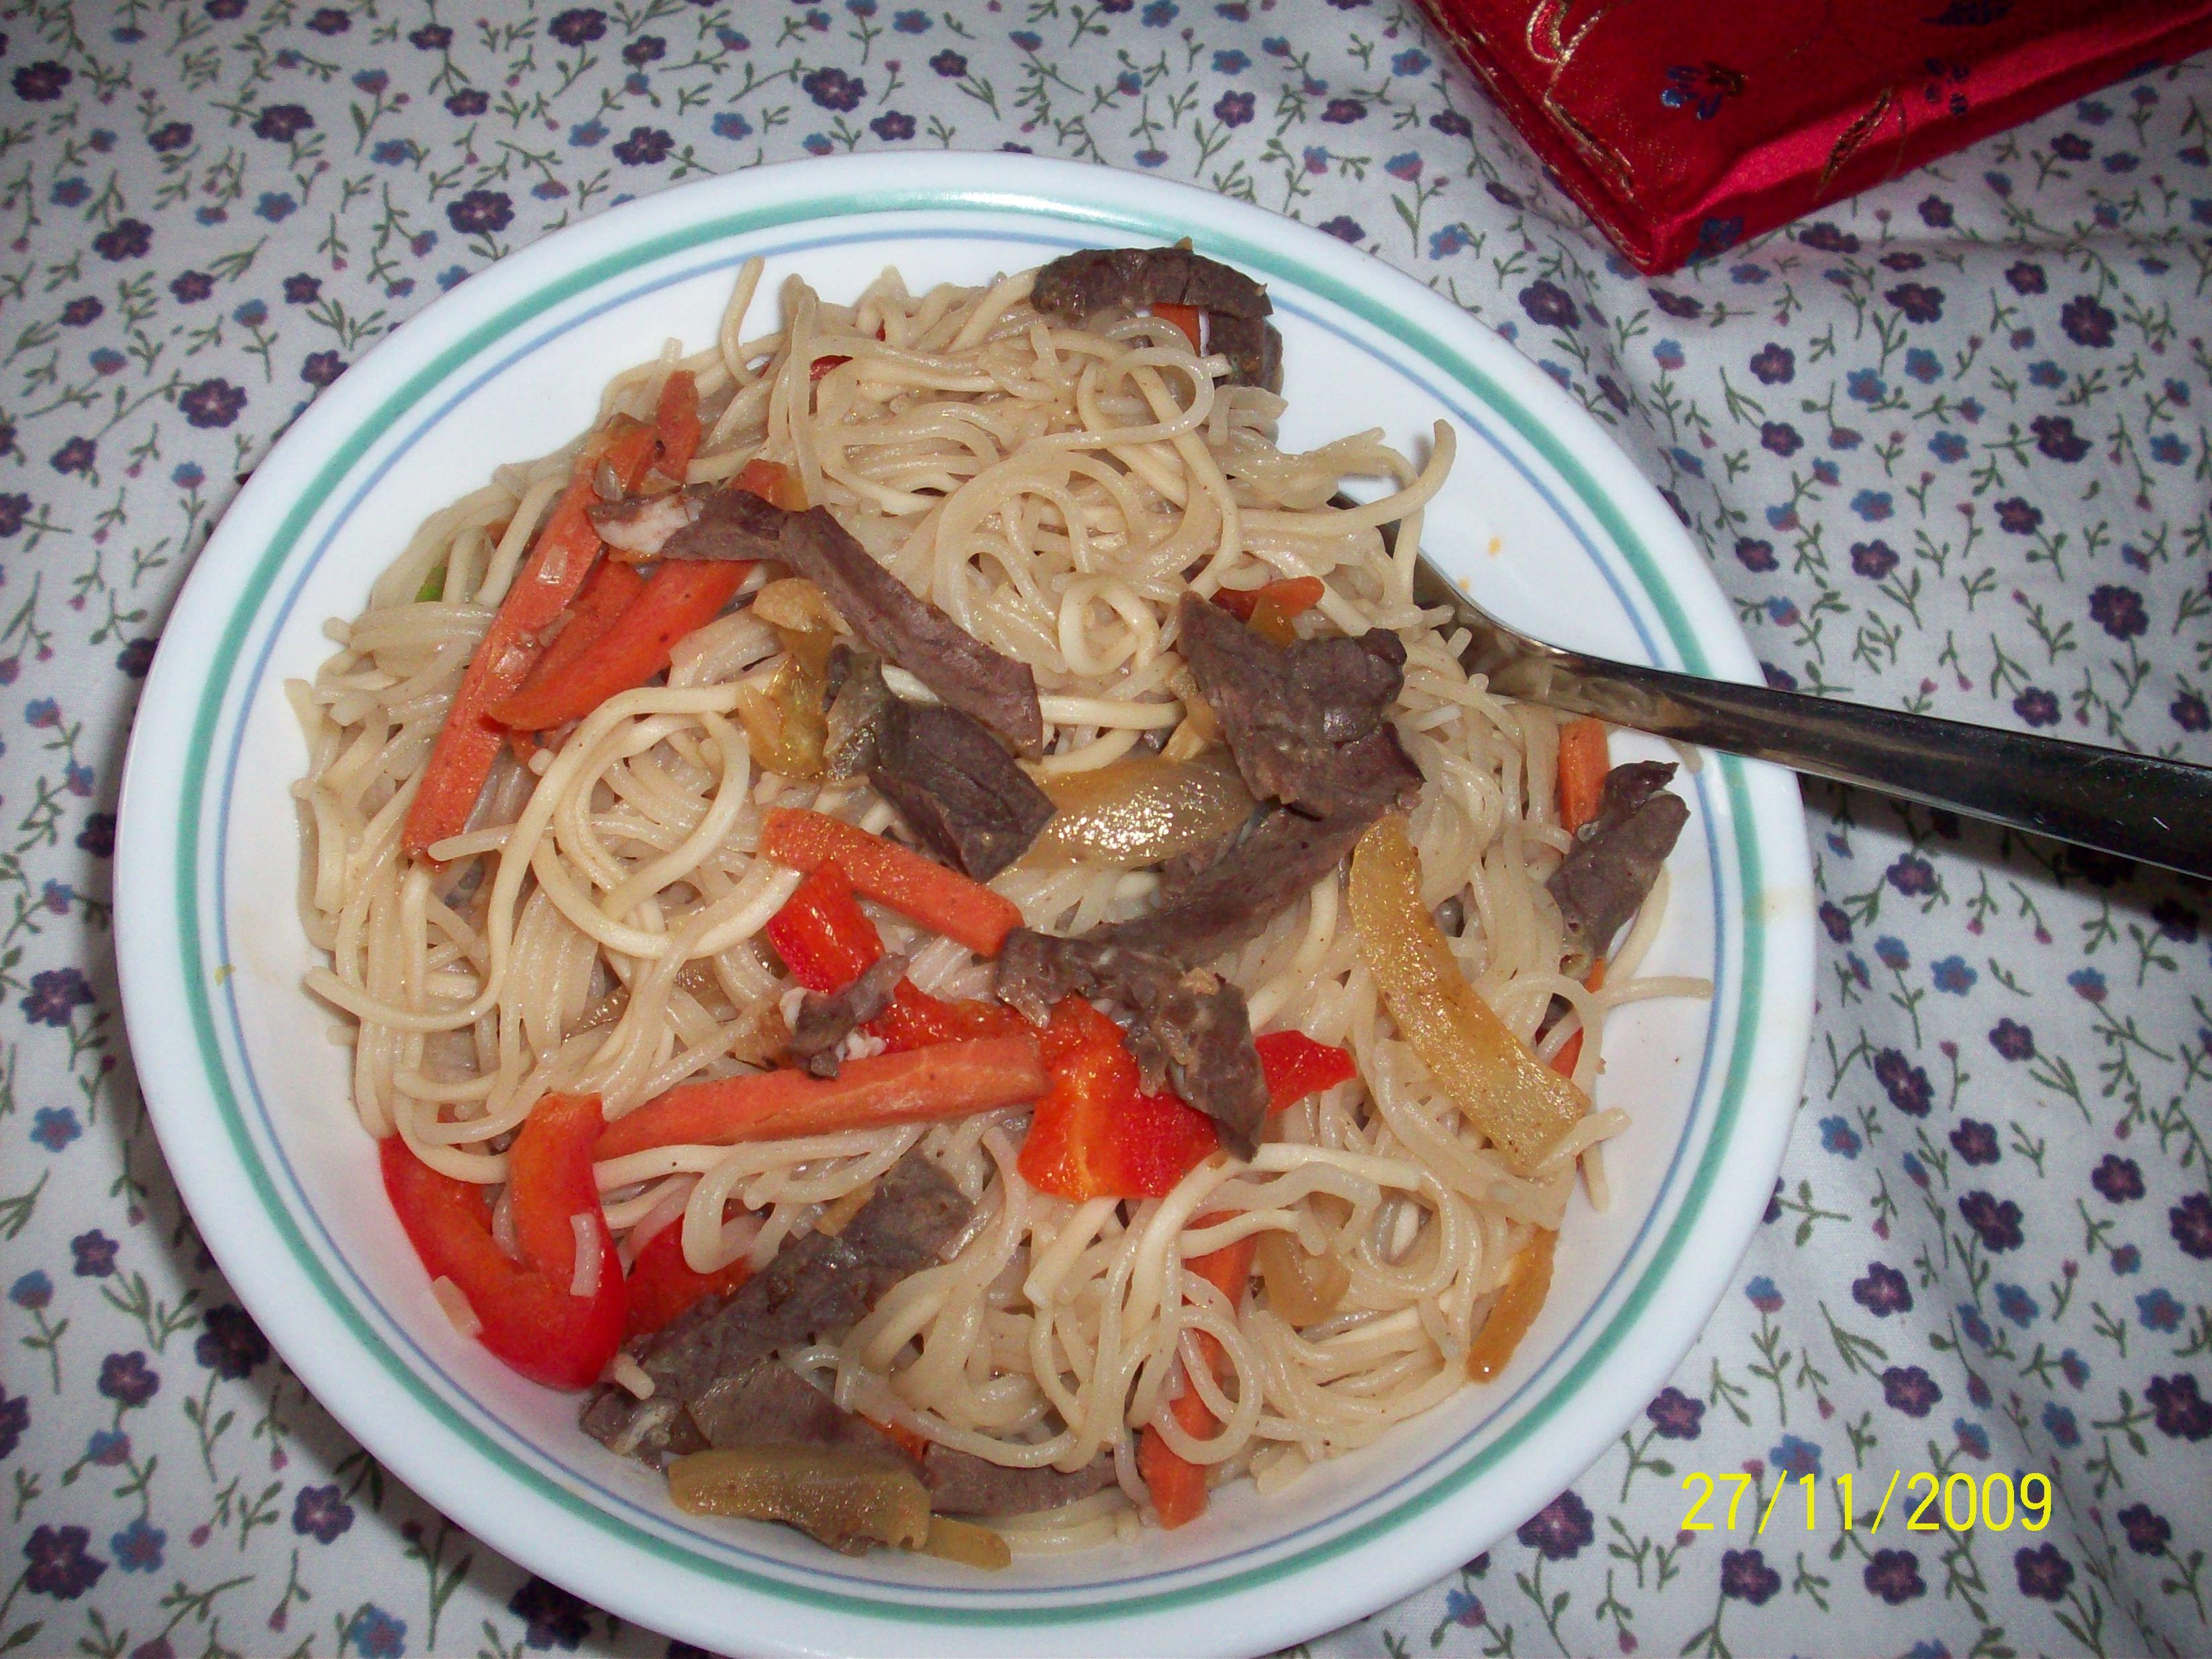 http://foodloader.net/cutie_2009-11-27_Stir-Fry_Noodles.jpg